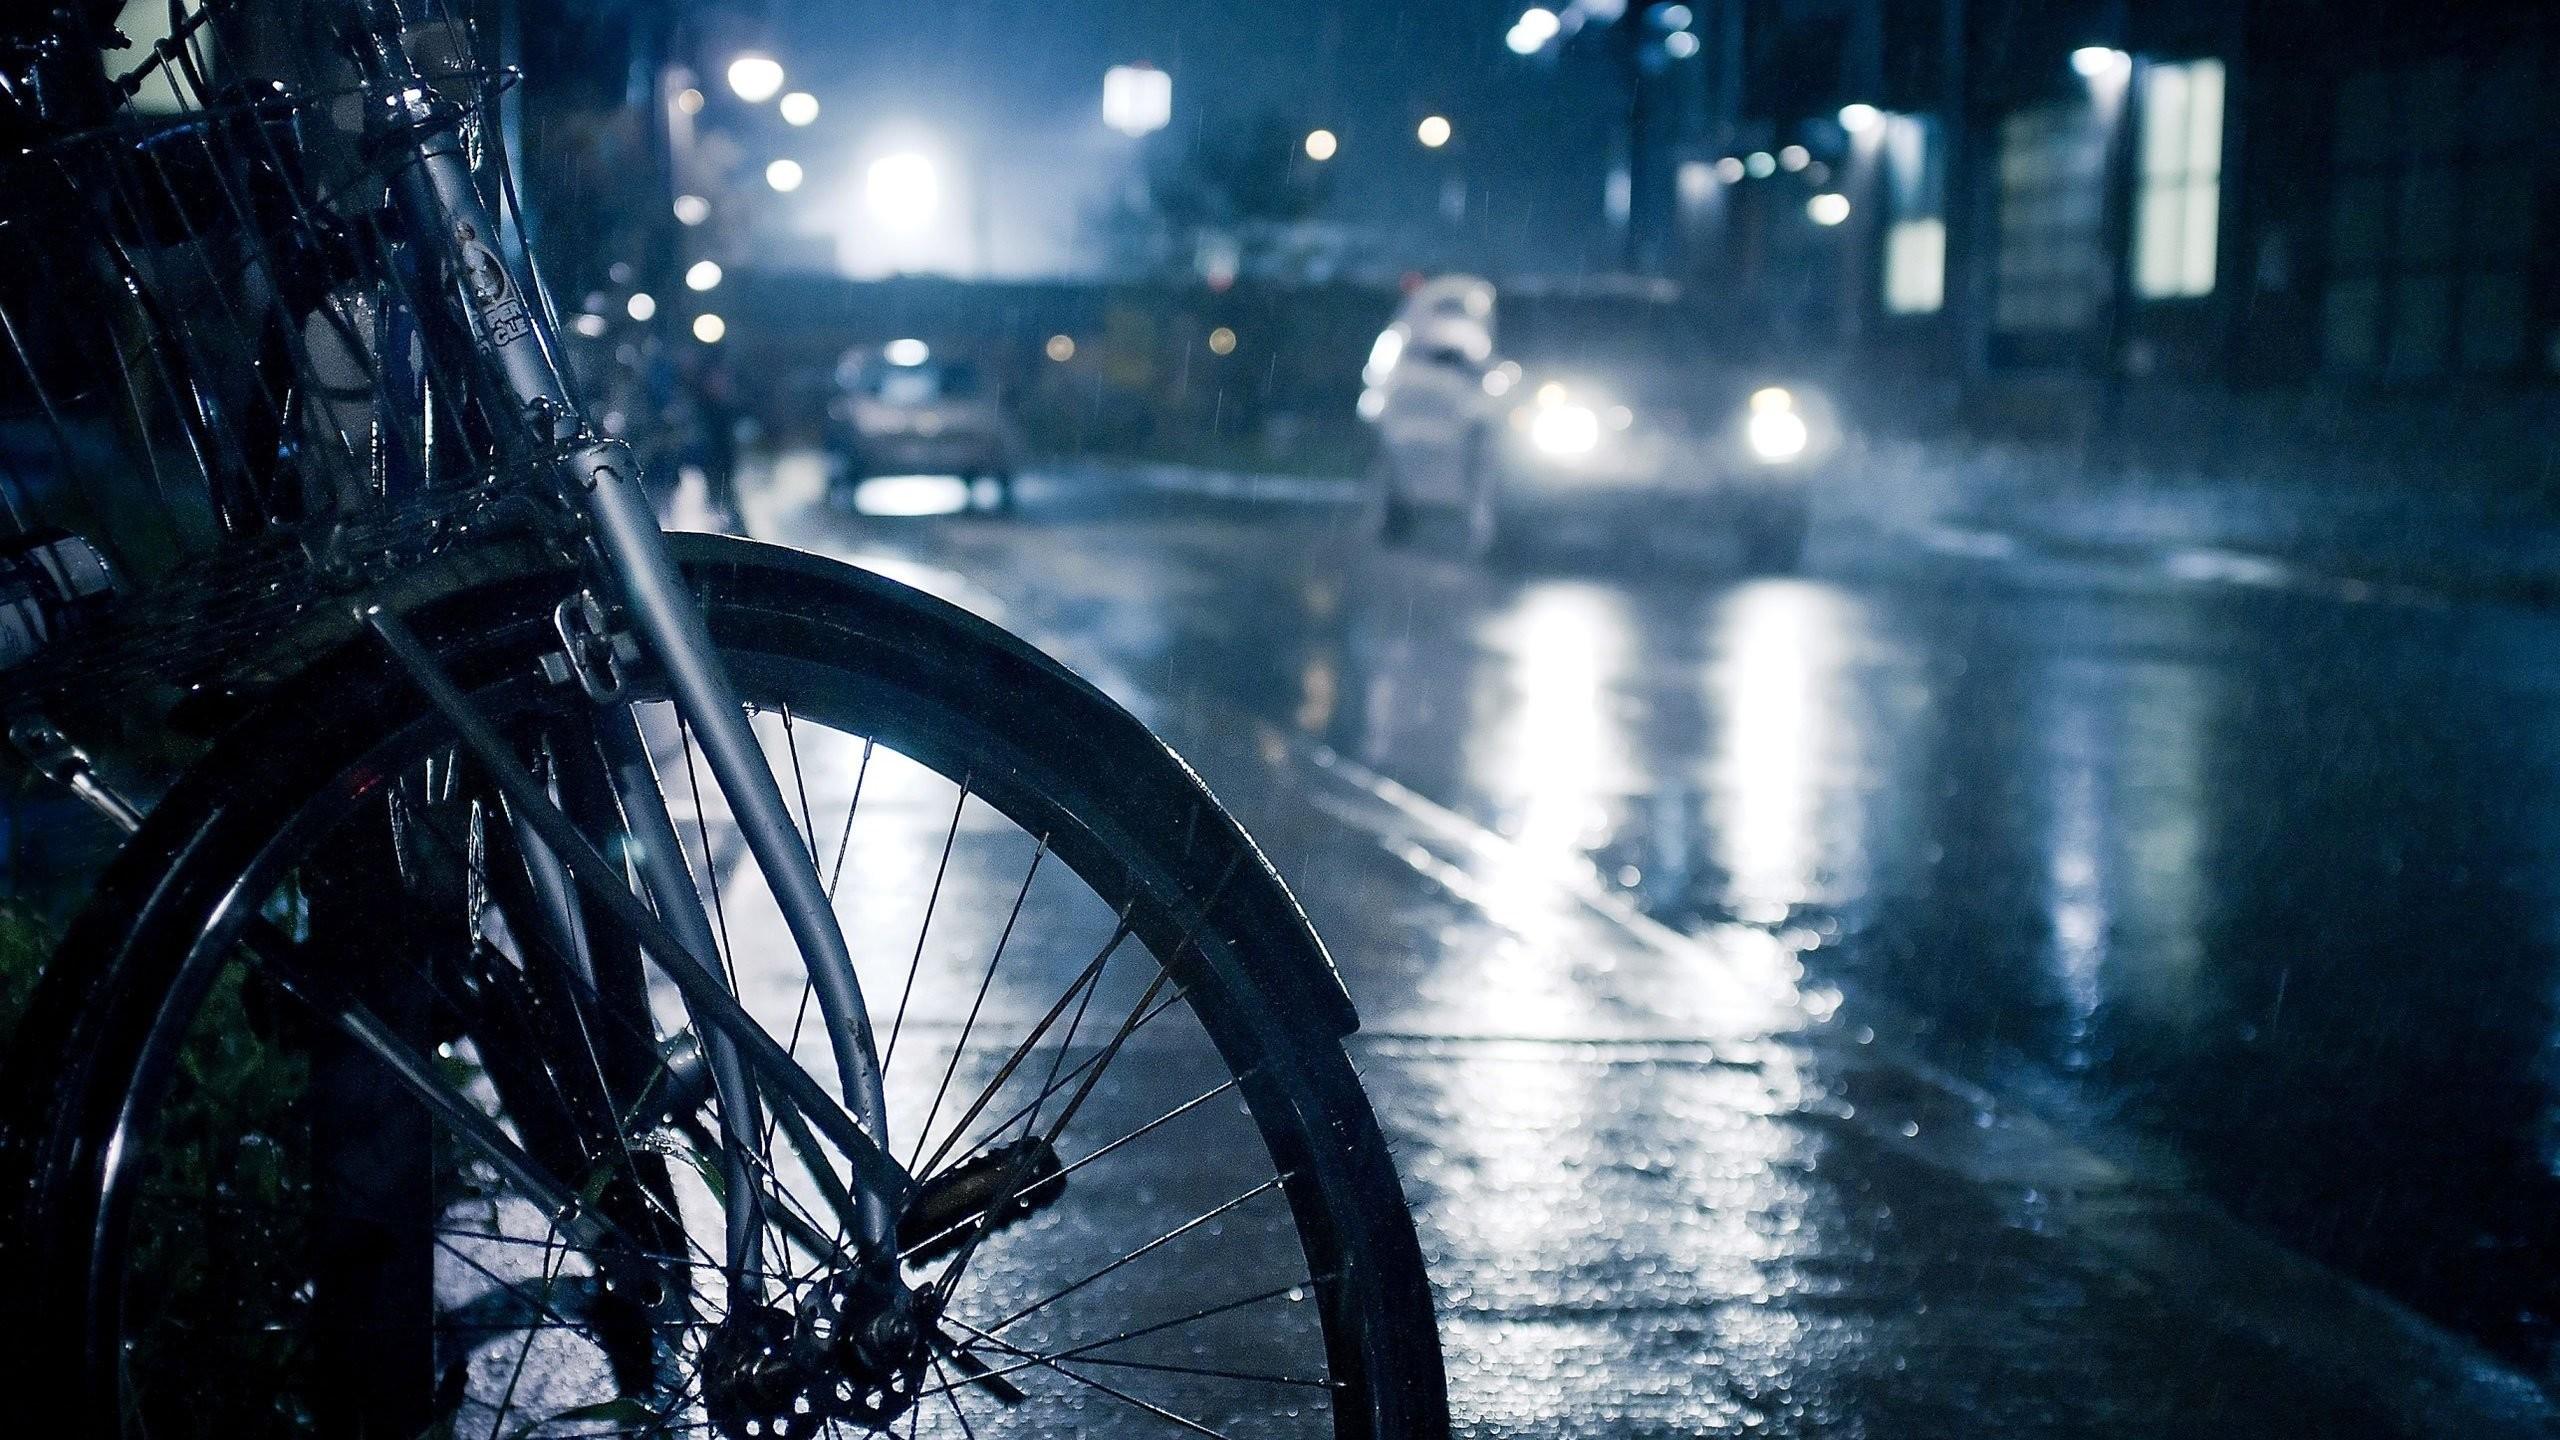 Night City Street Rain